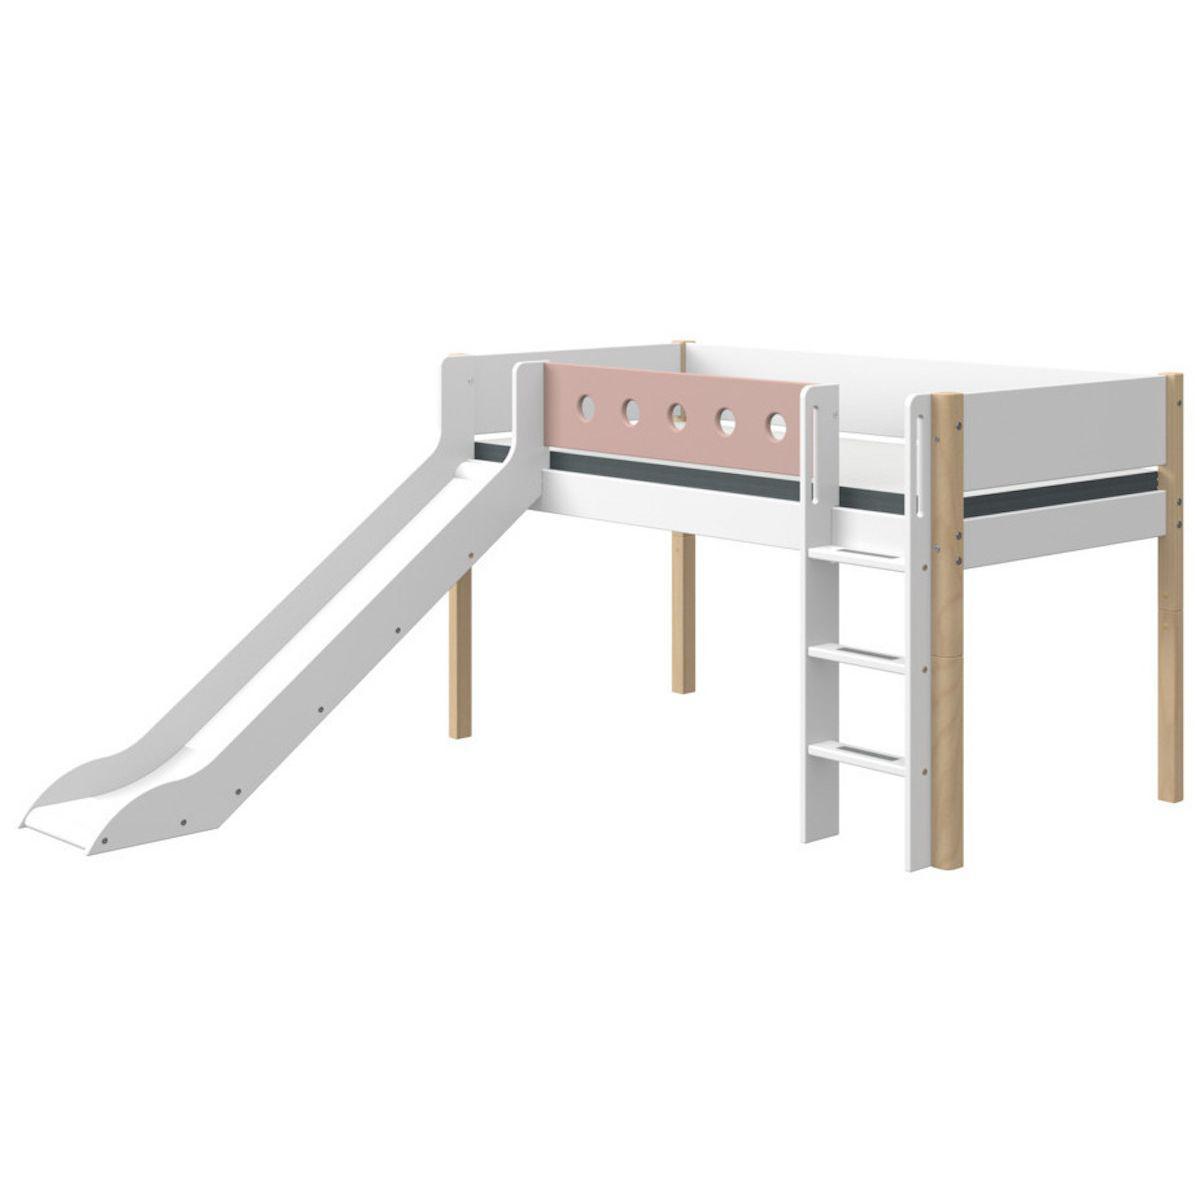 Cama media alta 90x190cm escalera recta-tobogán WHITE Flexa natural-rosa claro